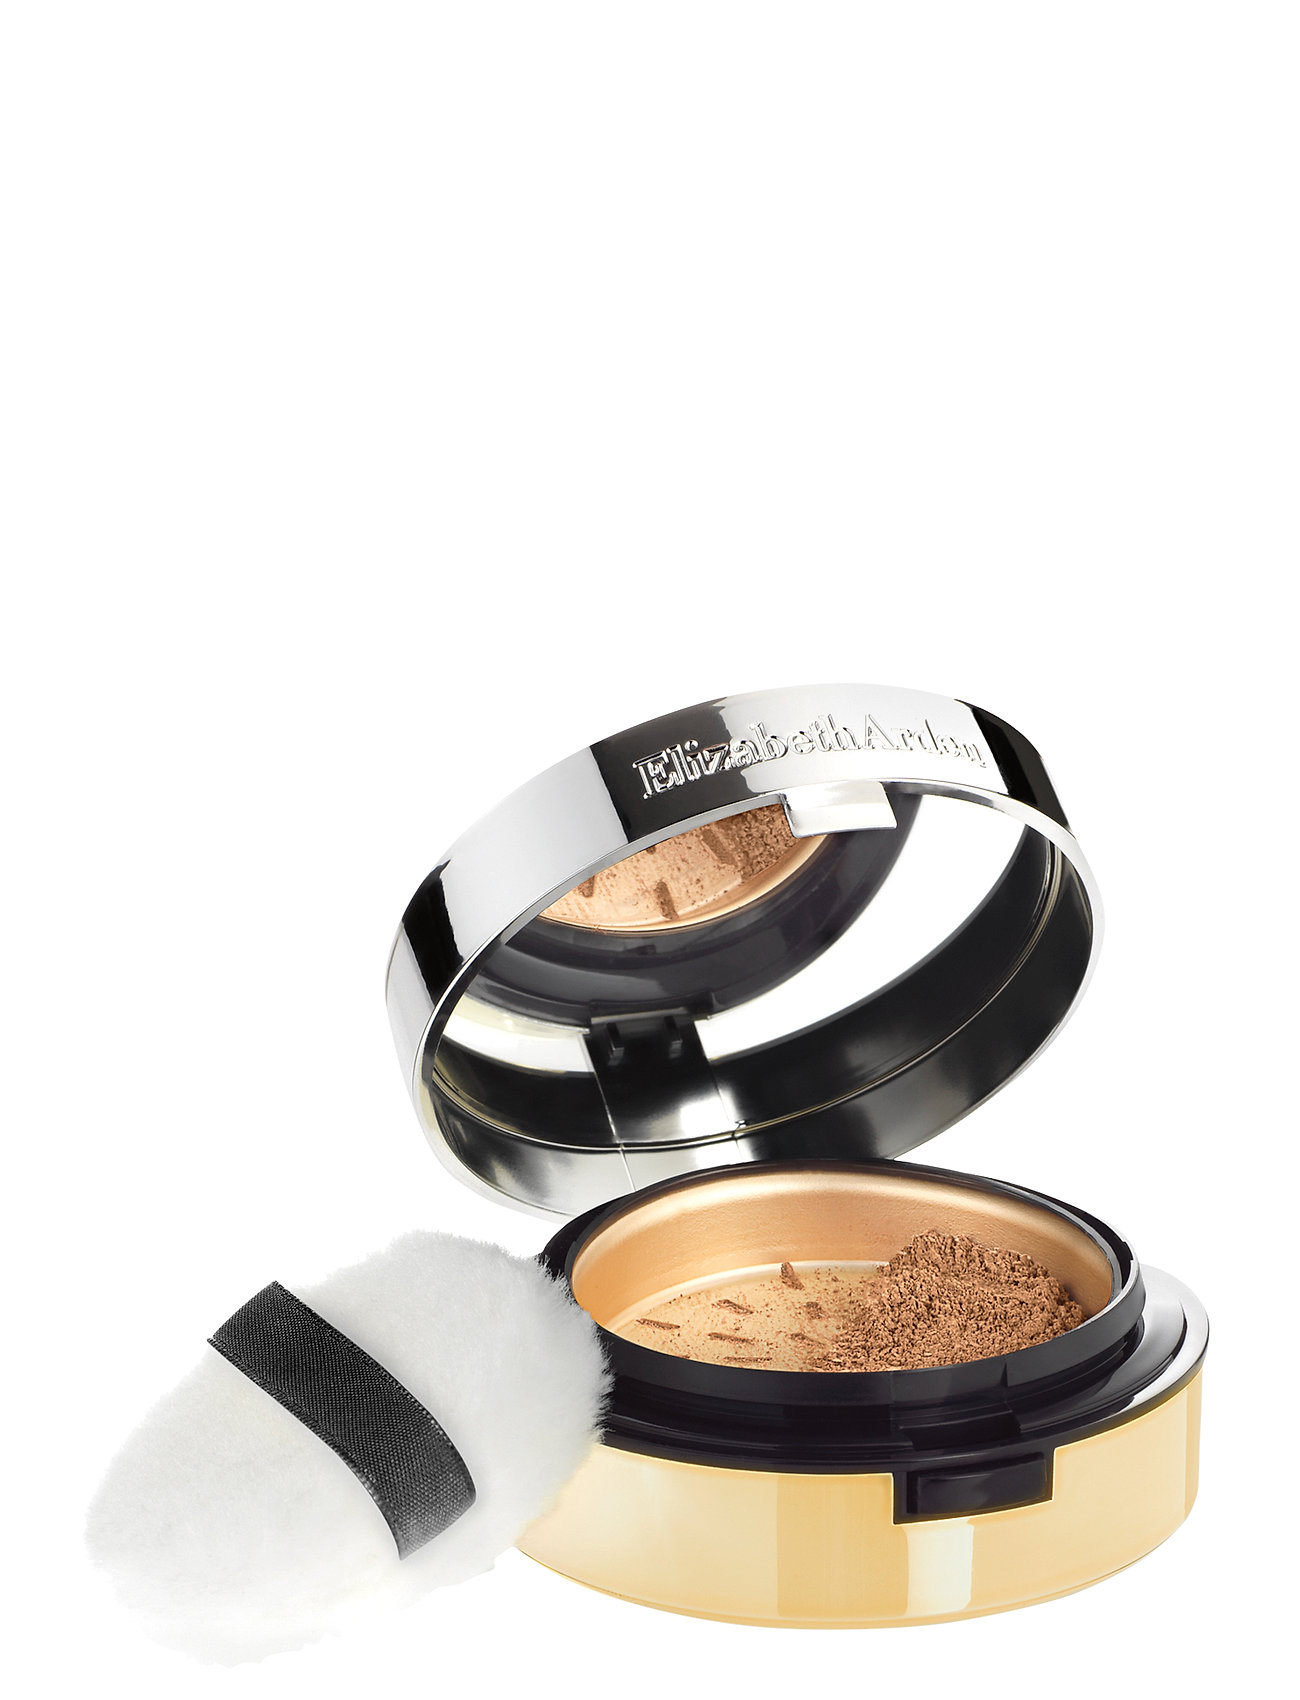 Image of Pure Finish Mineralfoundation 7 Pure Finish Pudder Makeup ELIZABETH ARDEN (3067500751)